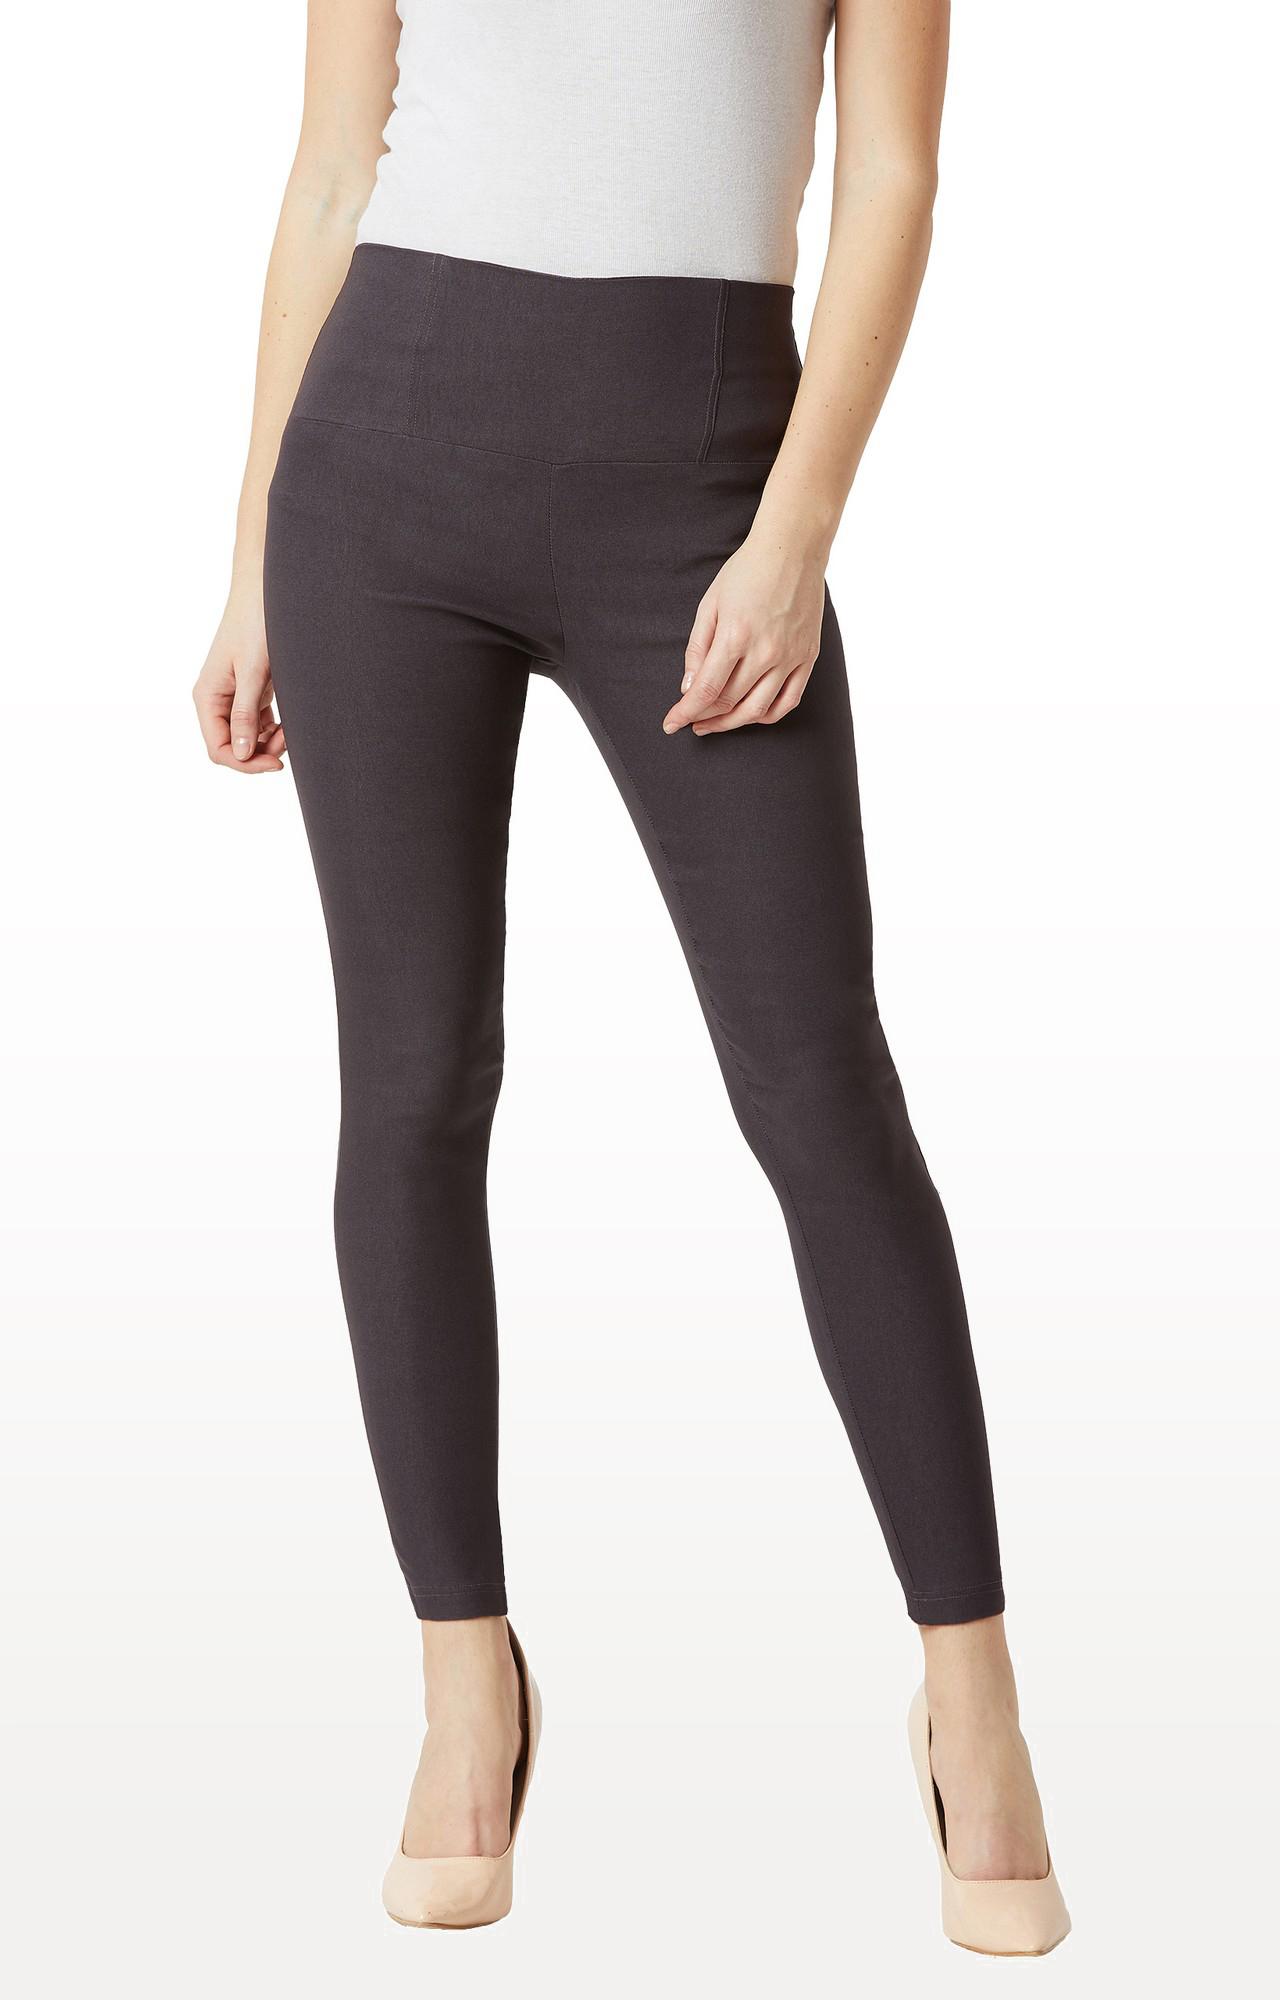 MISS CHASE | Dark Grey Solid High Waist Patch Pocket Regular Length Jeggings